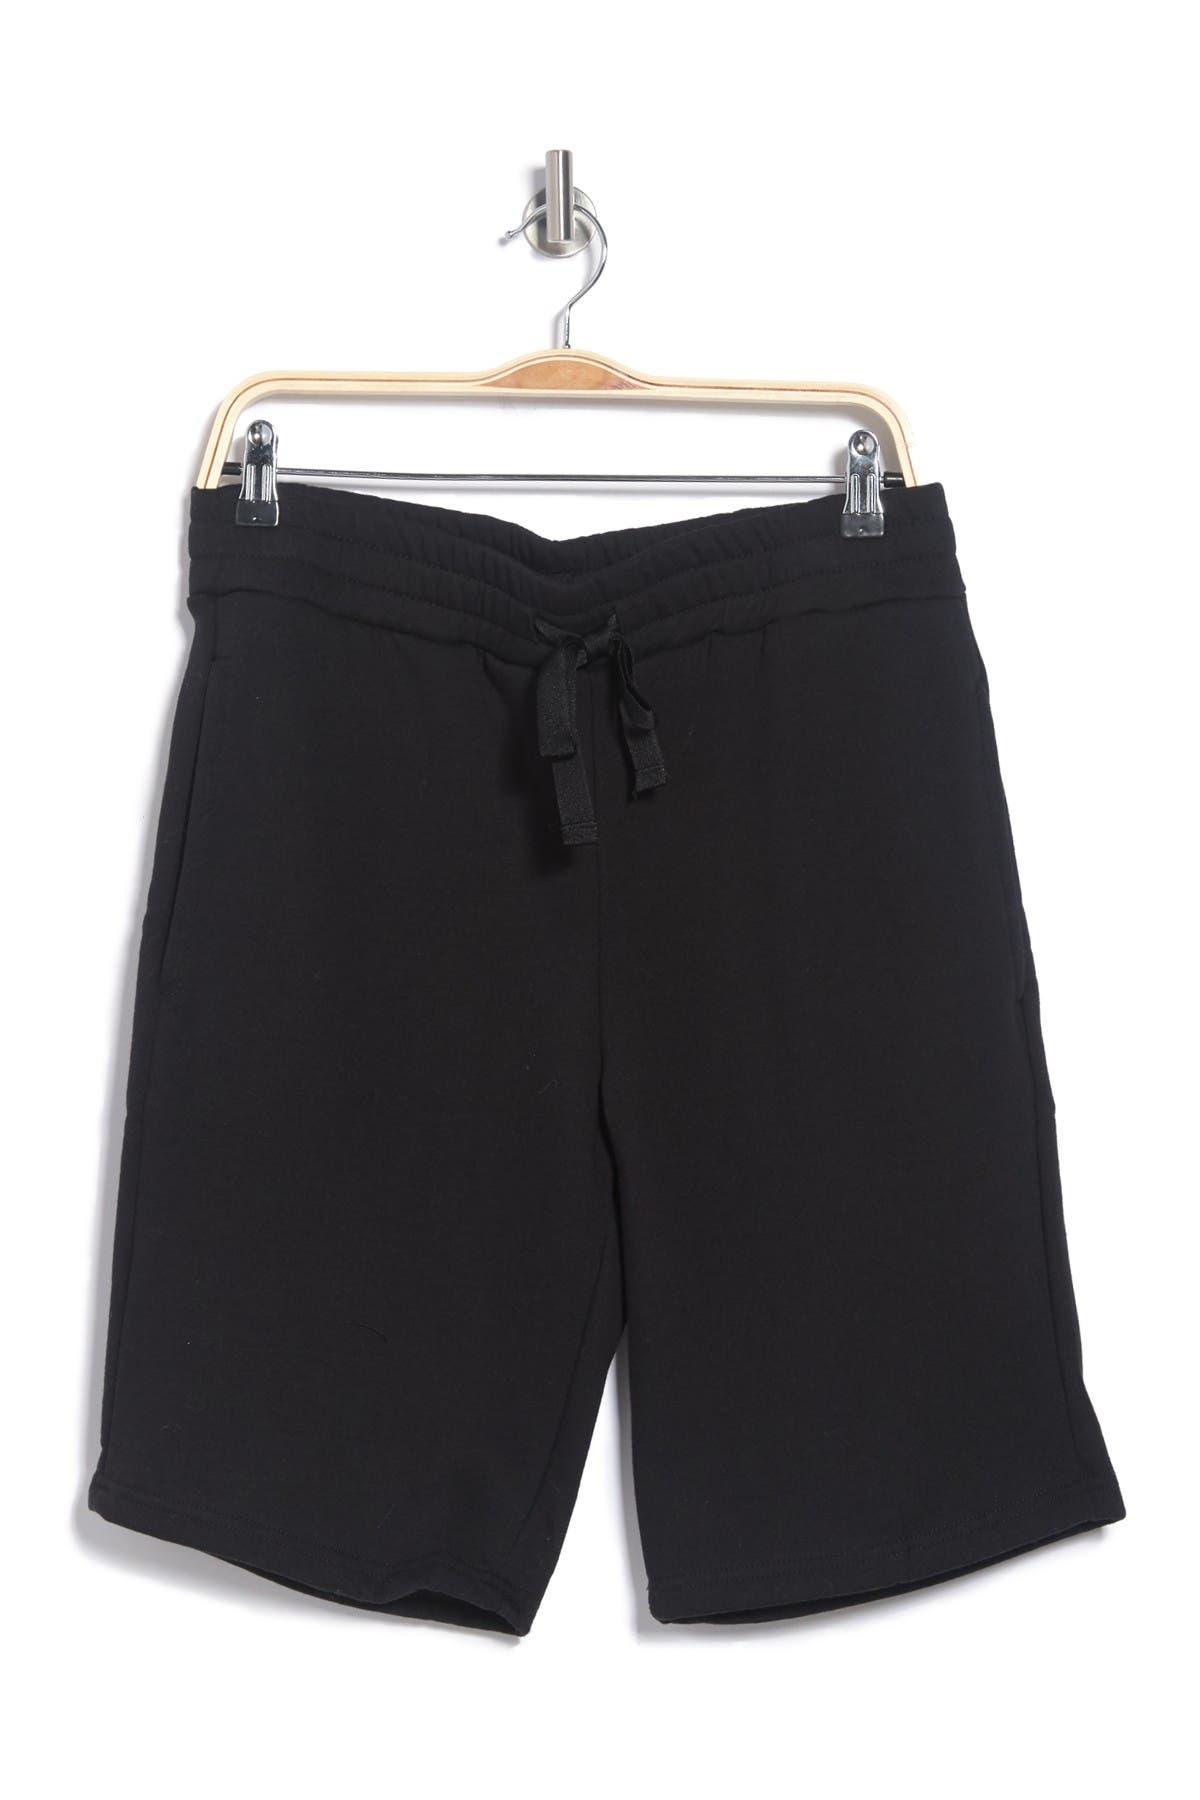 Loungehero Black & Gray Pocket Shorts Set